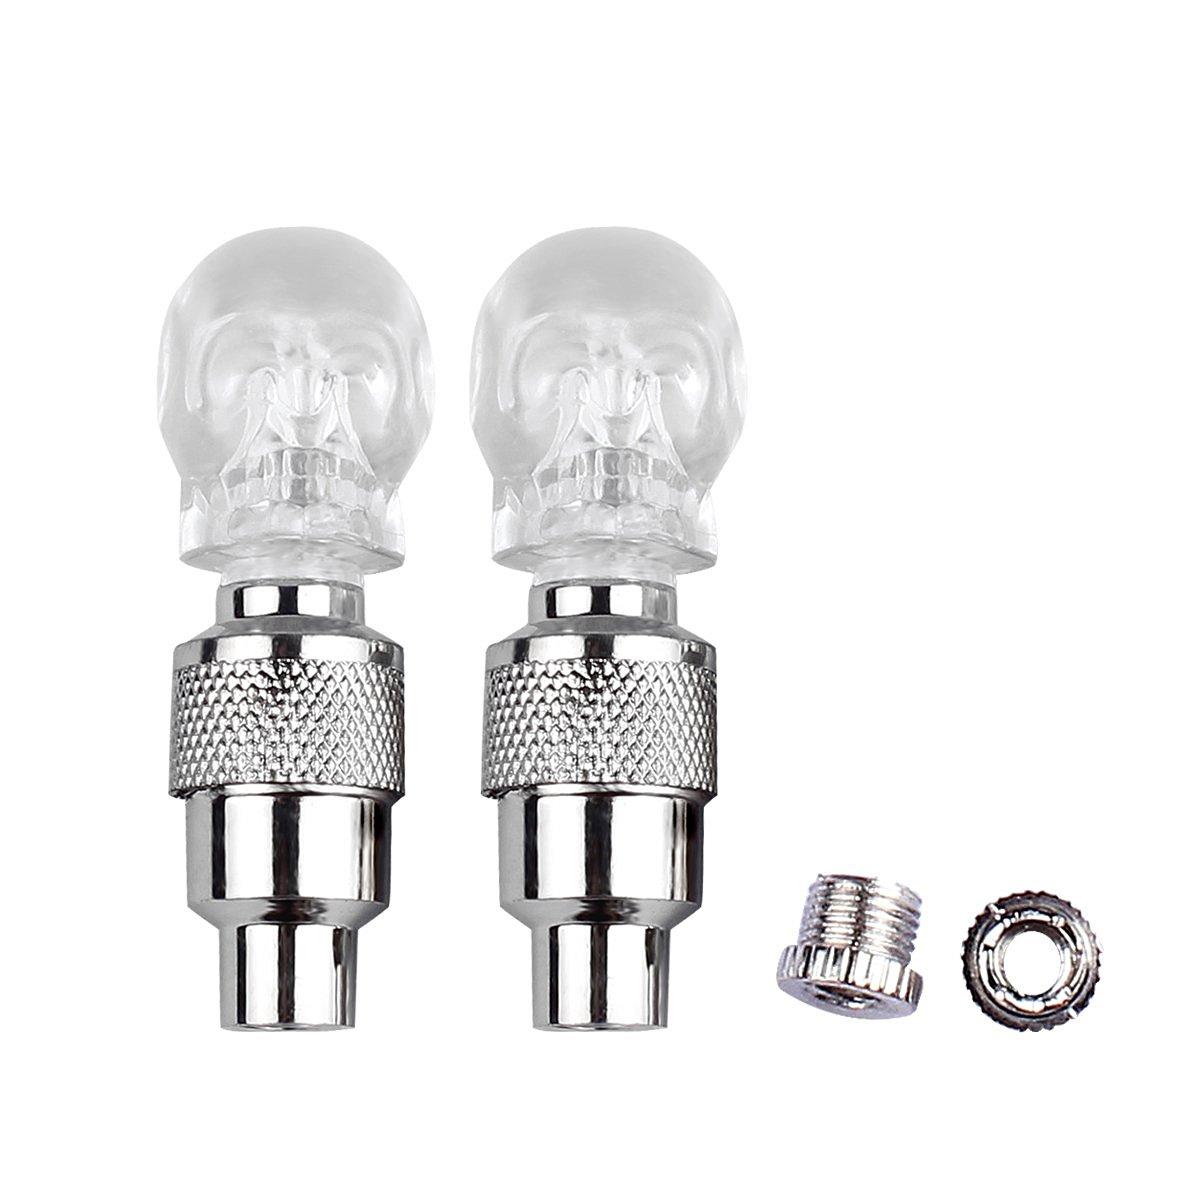 Ocathnon A Pair of Flashing LED Valve Cap Light Wheel Tyre Lamp Bulb For Car Vehicle Auto Trucks Motorcycle Bike Blue